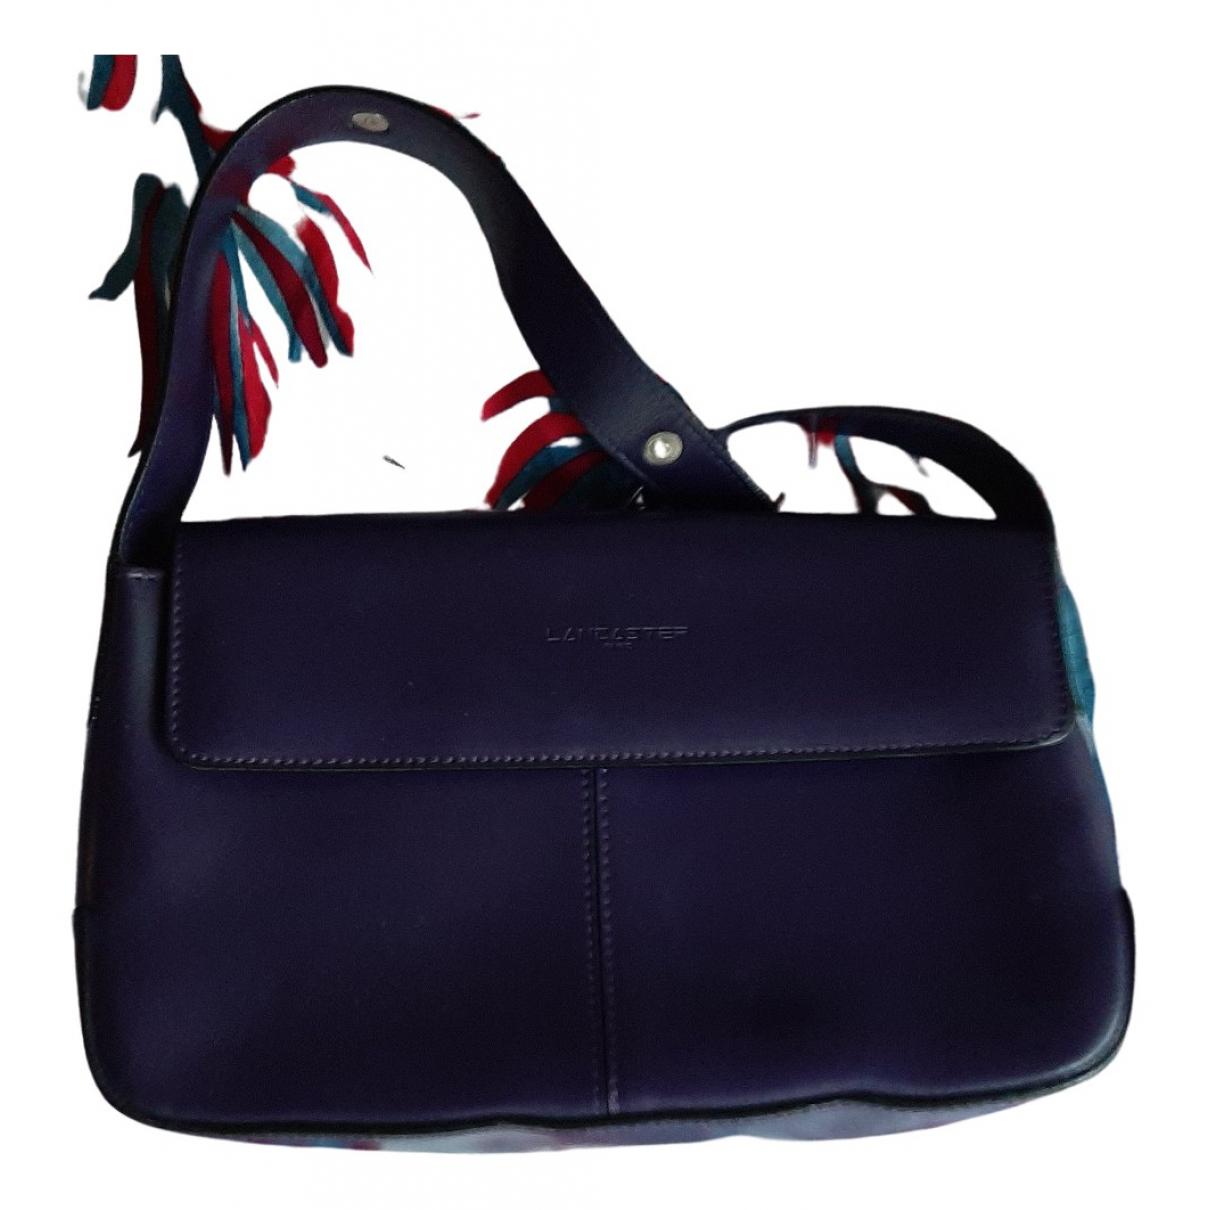 Lancaster N Purple Leather Clutch bag for Women N